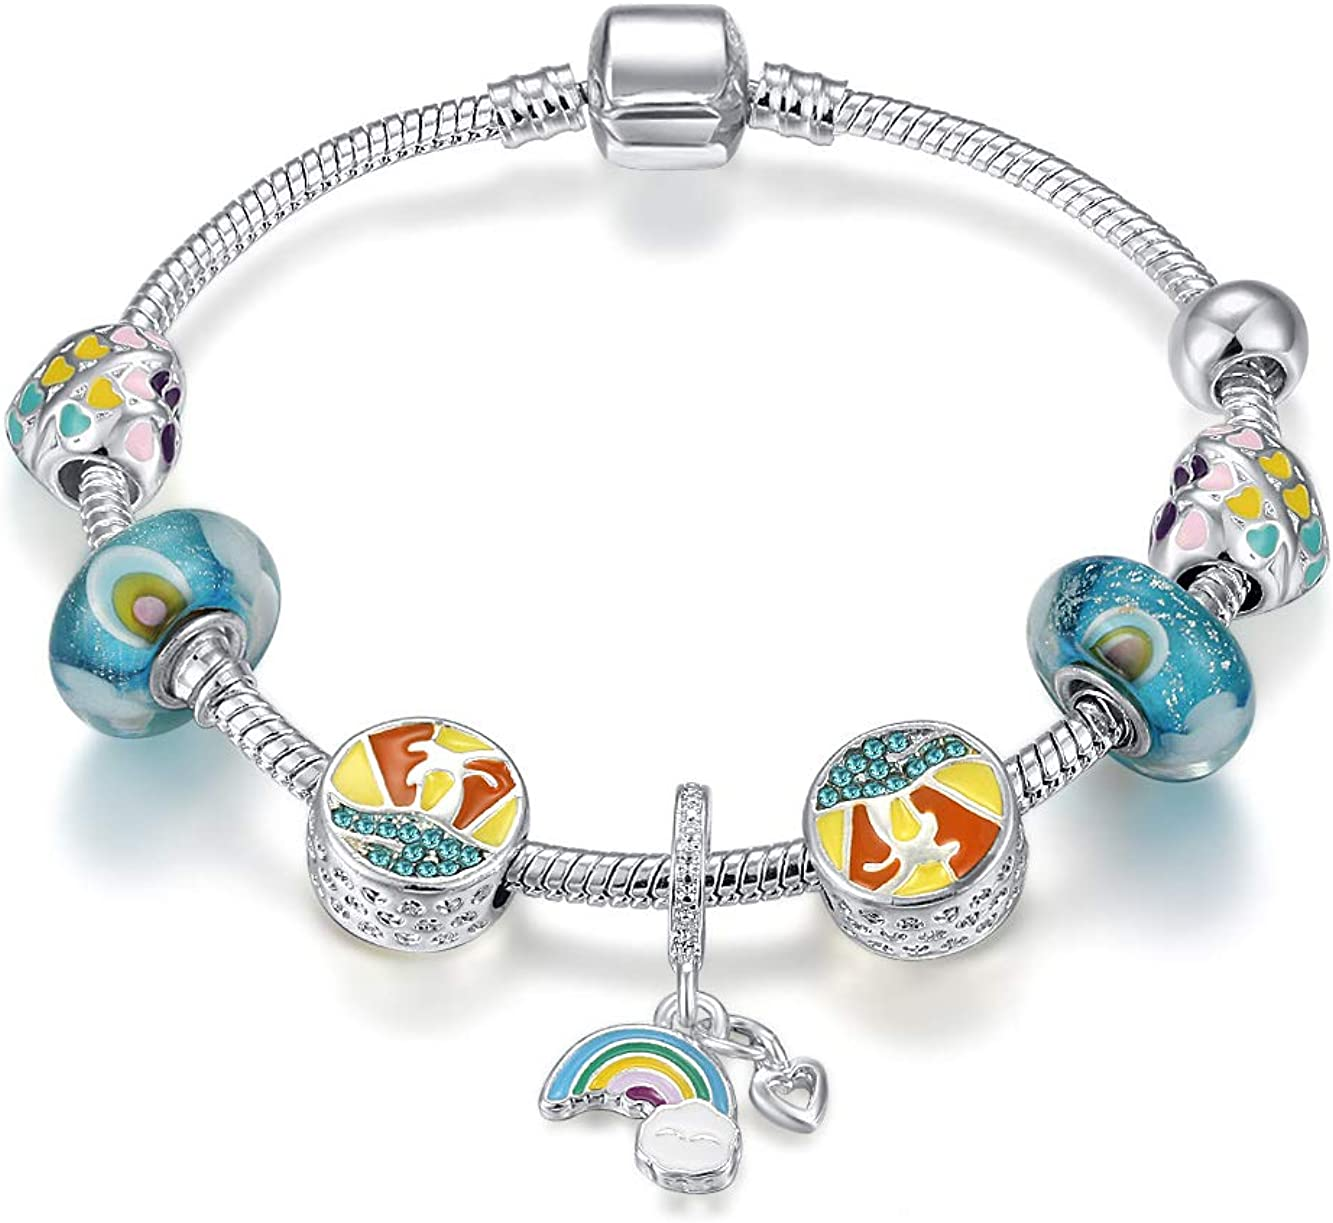 Women Charm Bracelet 925 Silver Plated Heart Love Bracelet Chain Fashion ZS